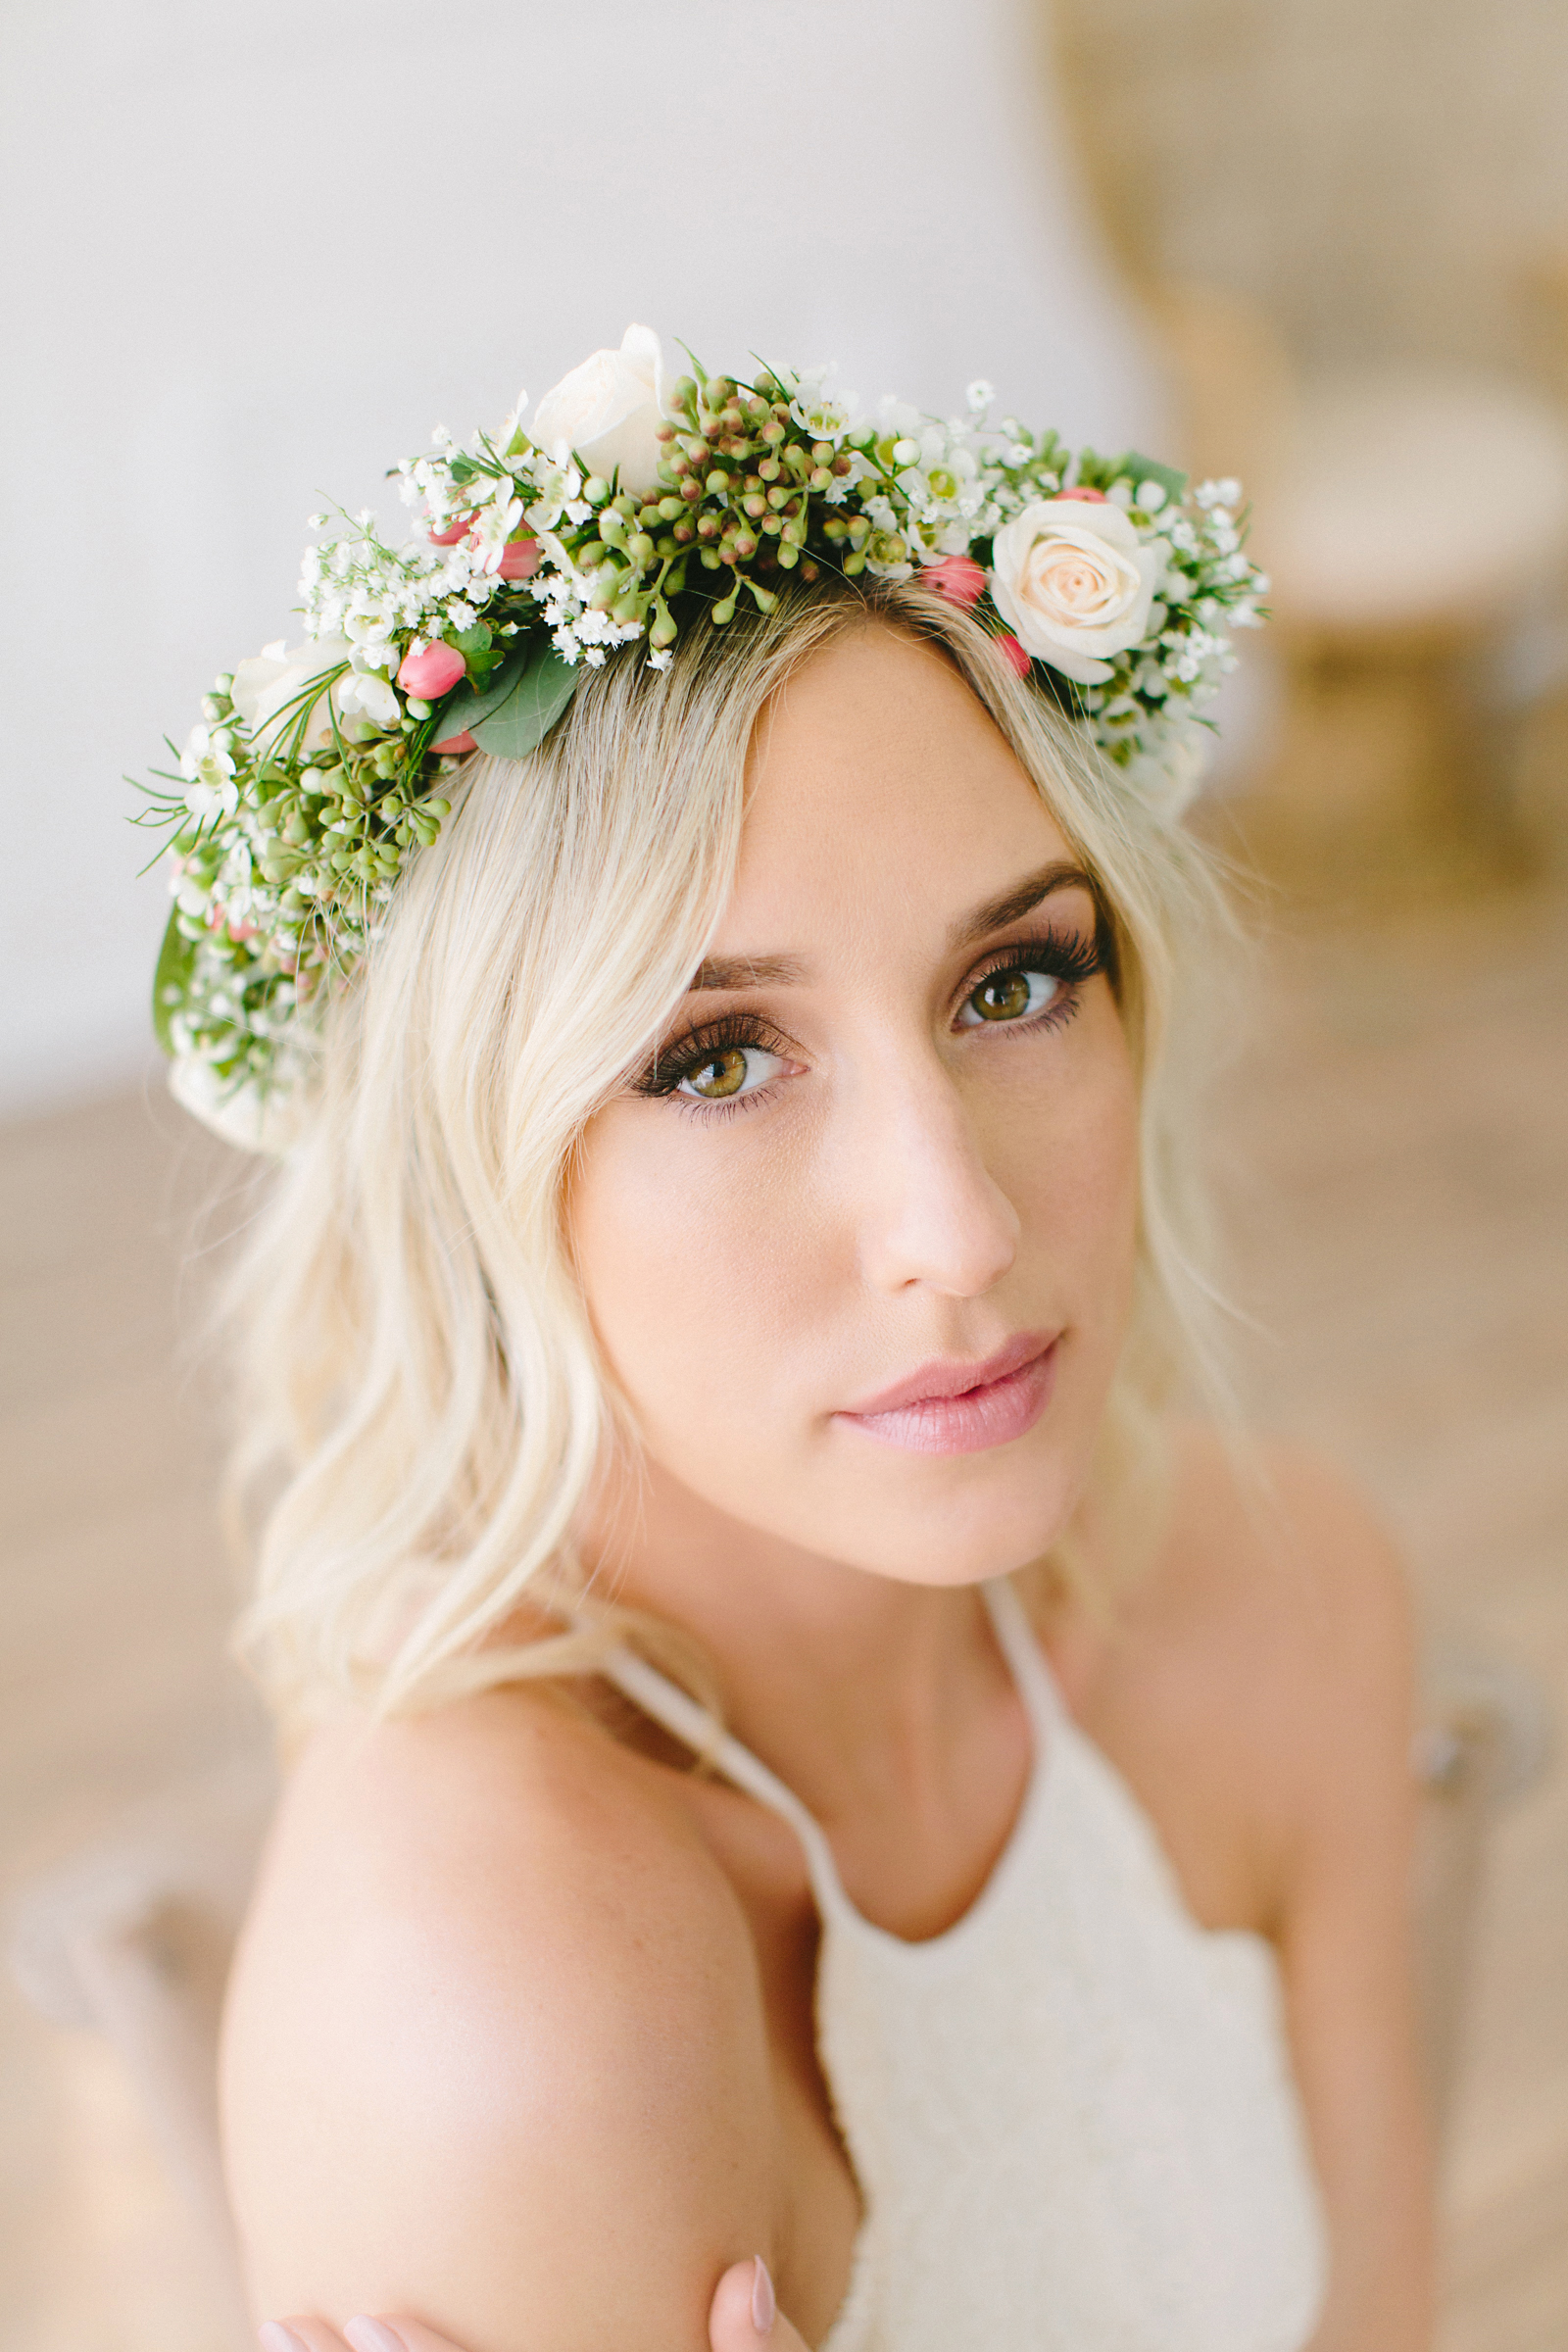 Nicole bridal 1.JPG